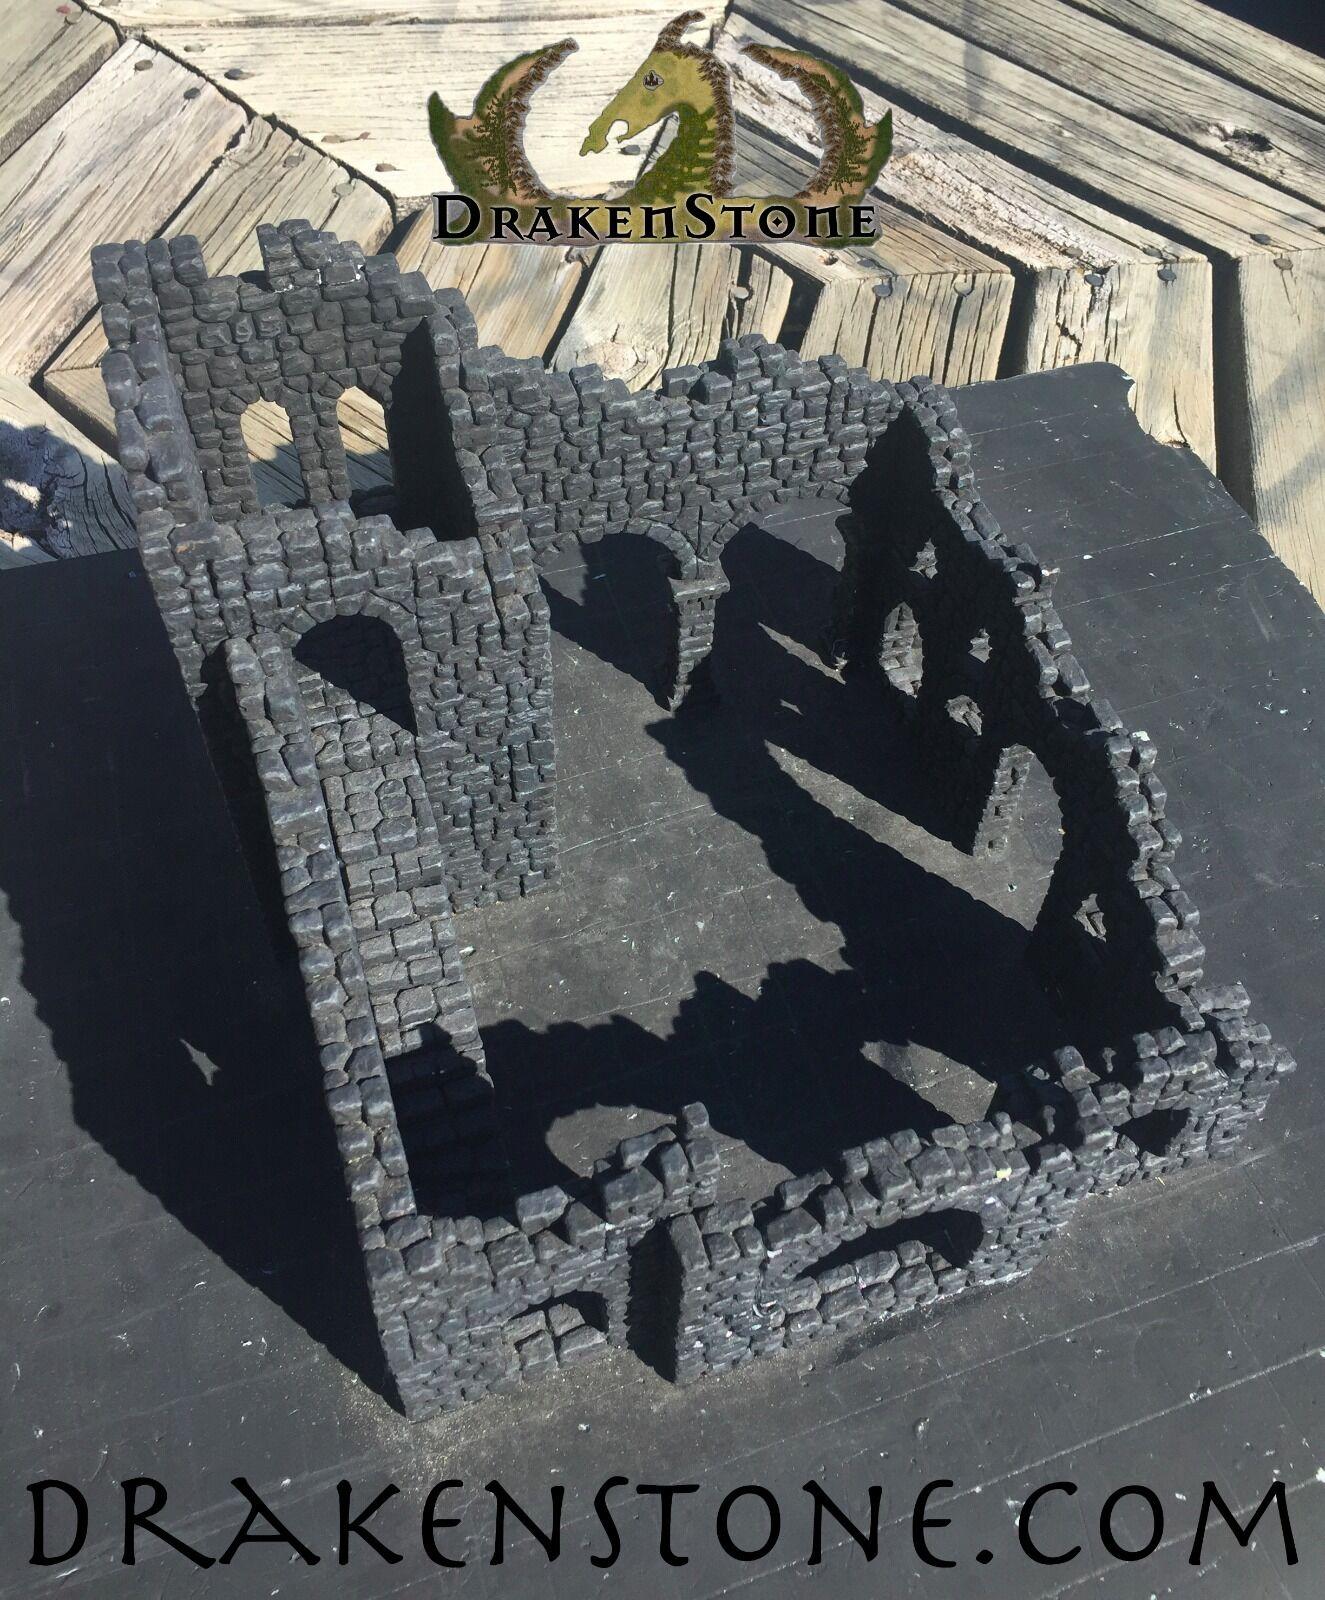 Drakenstone arruinado Fieldstone Torre Kit HYDROSTONE D&D Dwarven Forge Hirst Arts